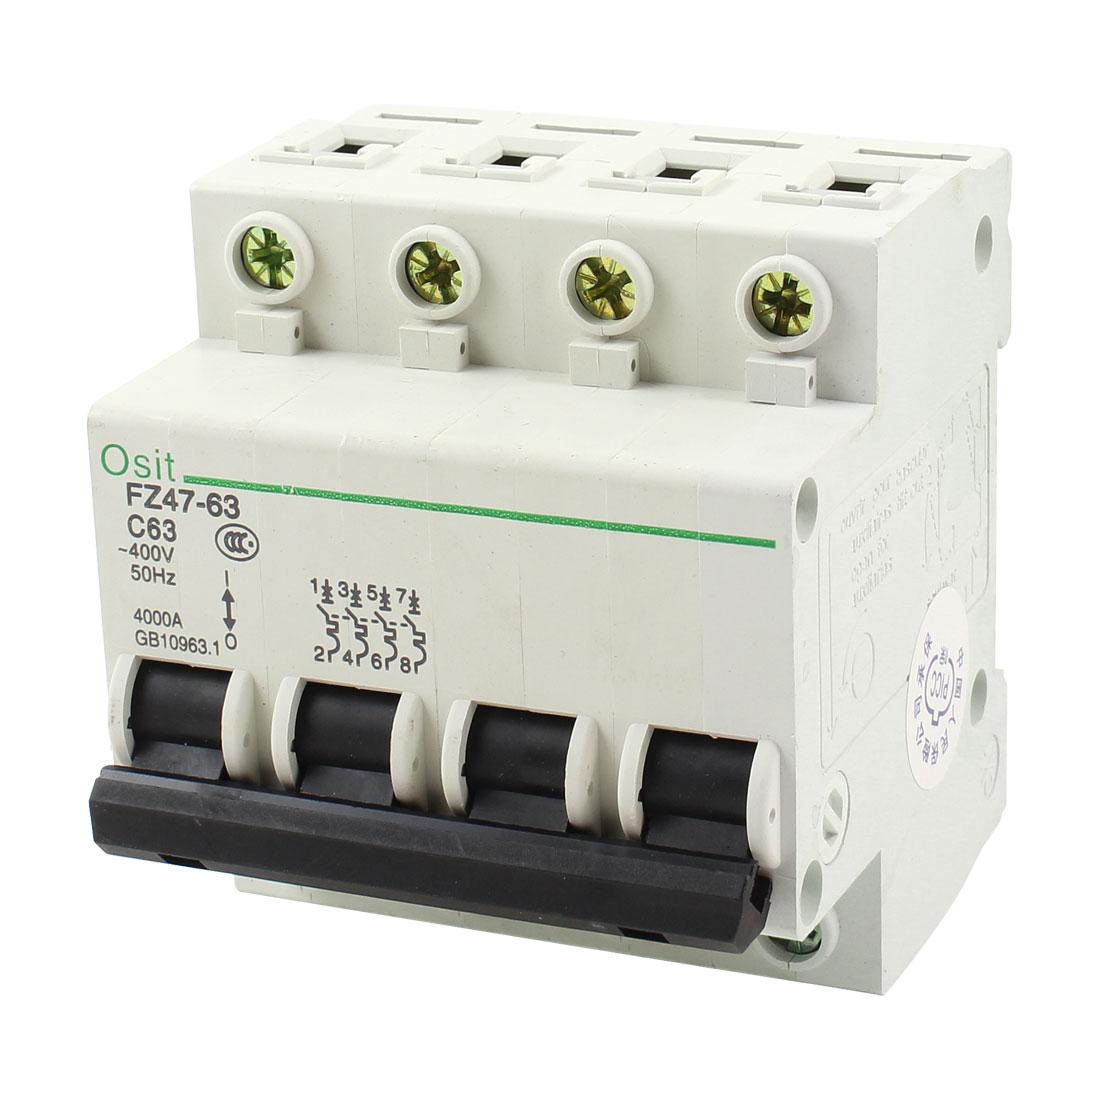 FZ47-63 C63 4P DIN Rail Mounted MCB Miniature Circuit Breaker 4000A 63A 400V AC